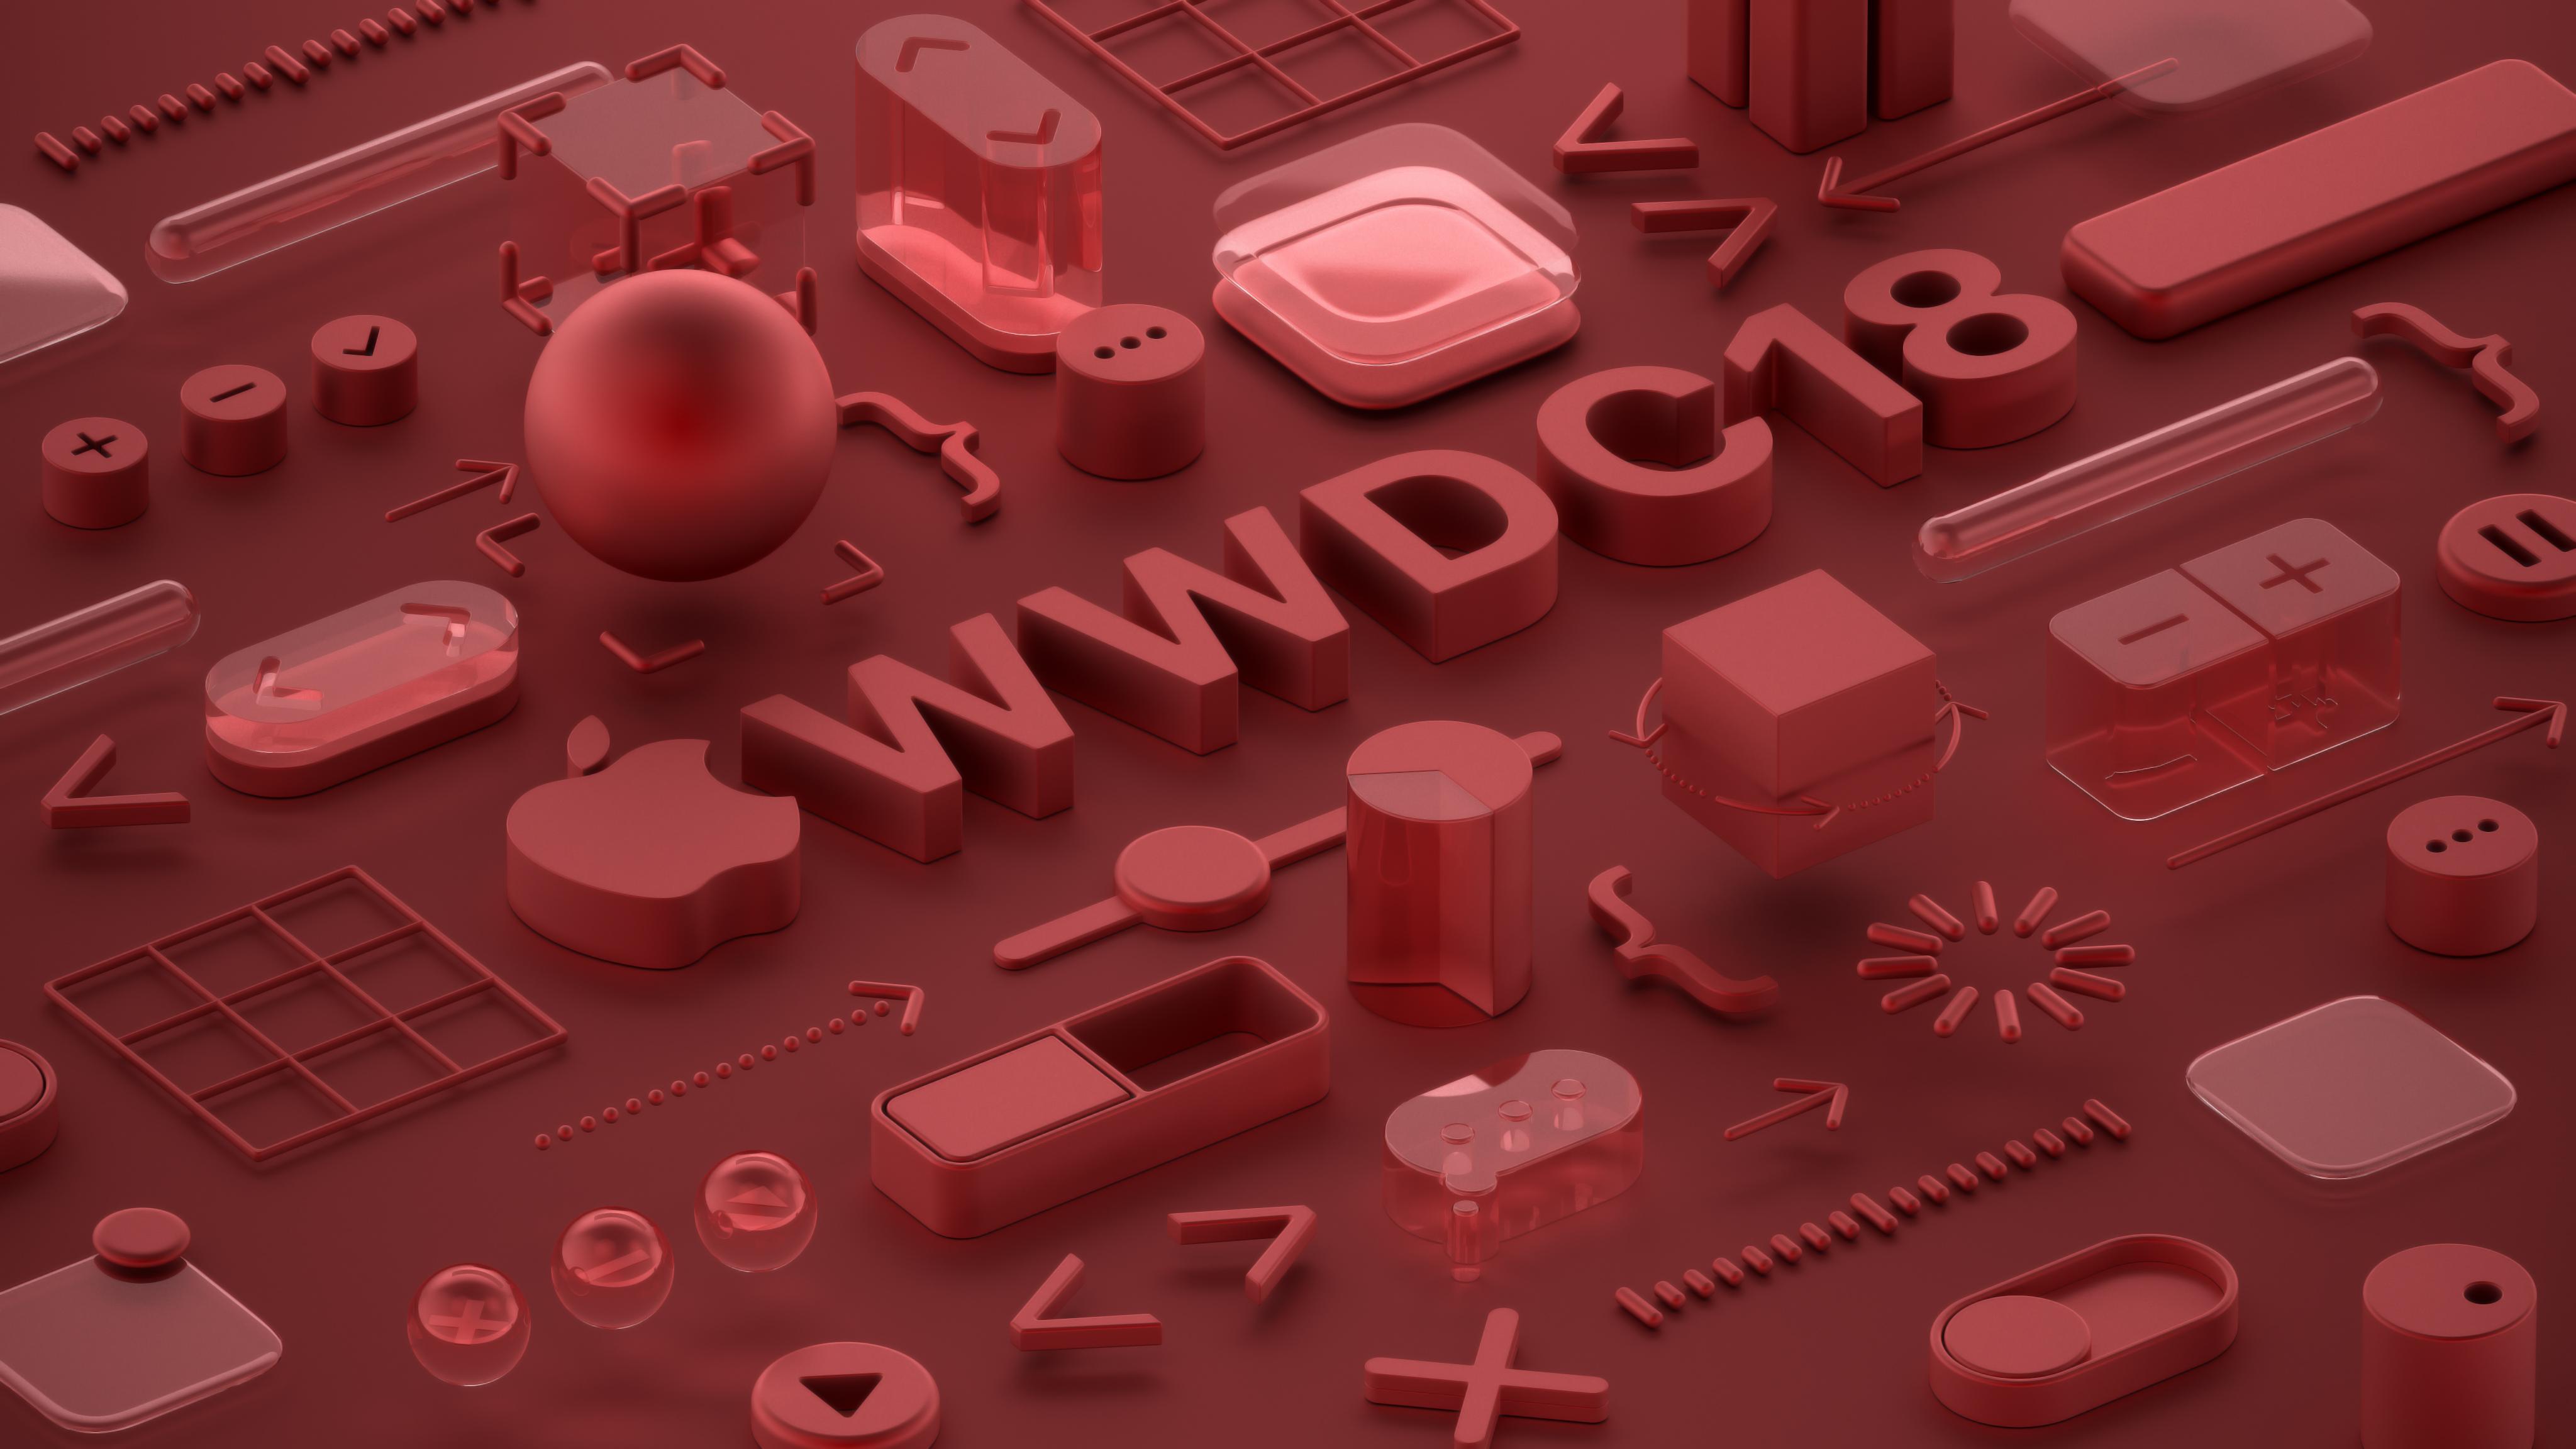 Wwdc Wallpaper 4k: Confira Mais Wallpapers Da WWDC 2018, Agora Para Macs